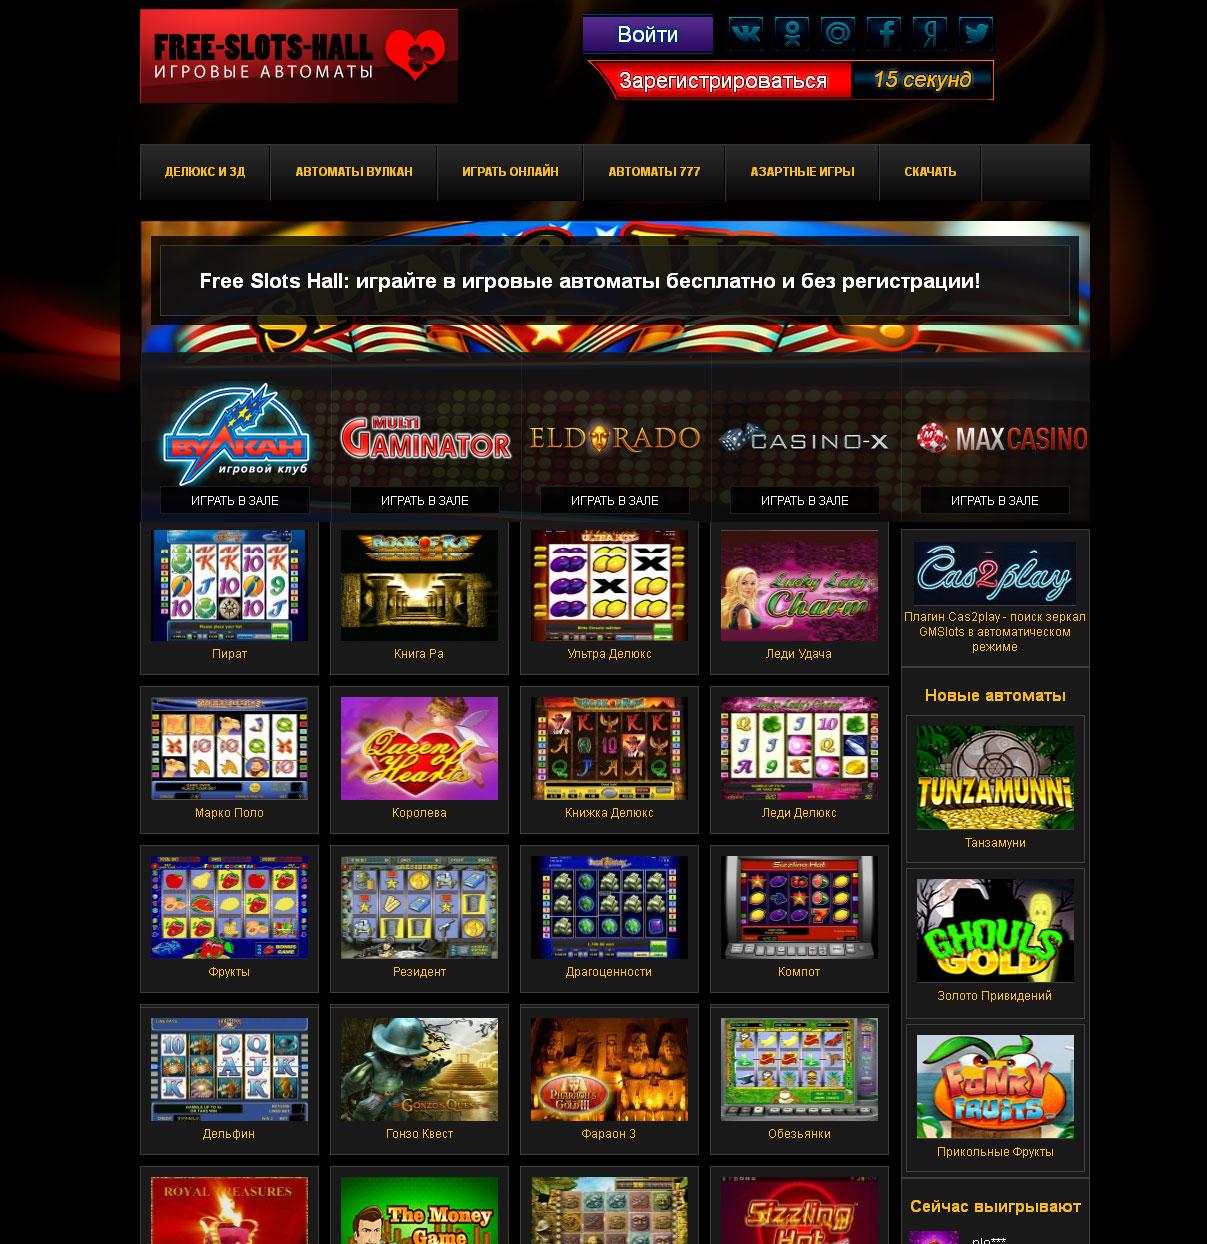 Советские игровые автоматы ява игра заработок на интернет казино лохотрон или нет